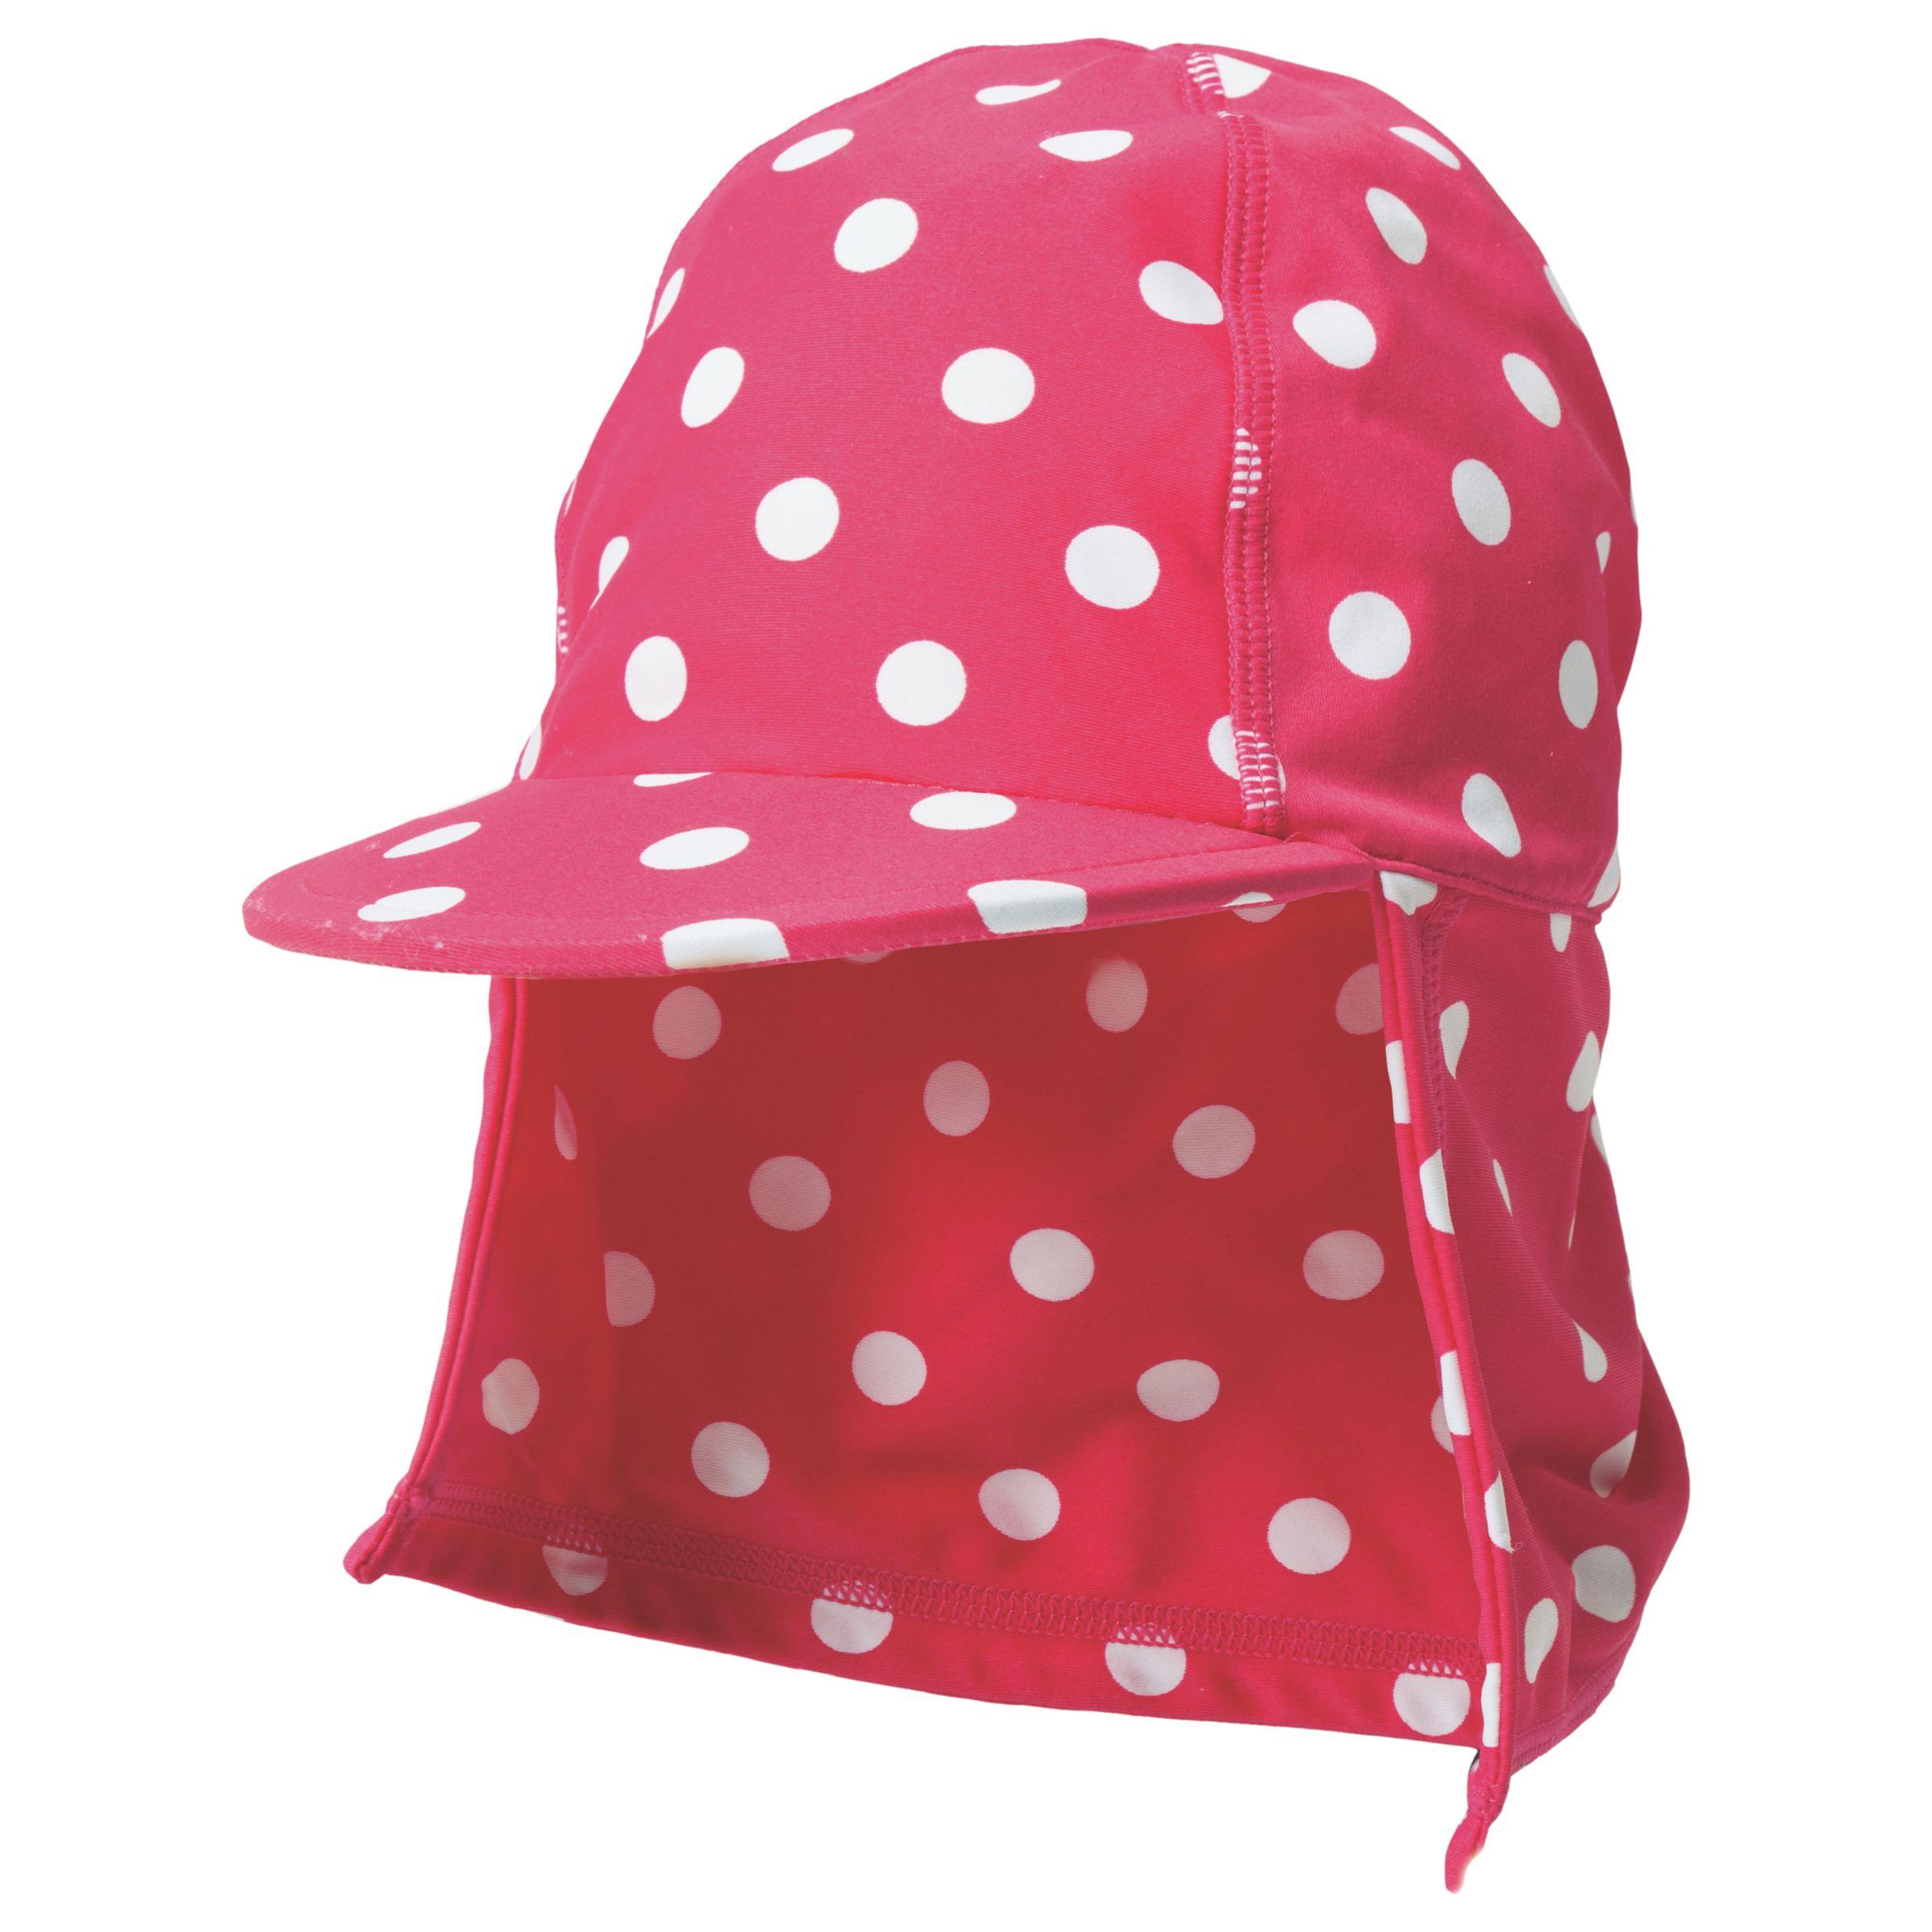 Frugi Organic Frugi Organic Baby Little Swim Spotted Hat, Pink